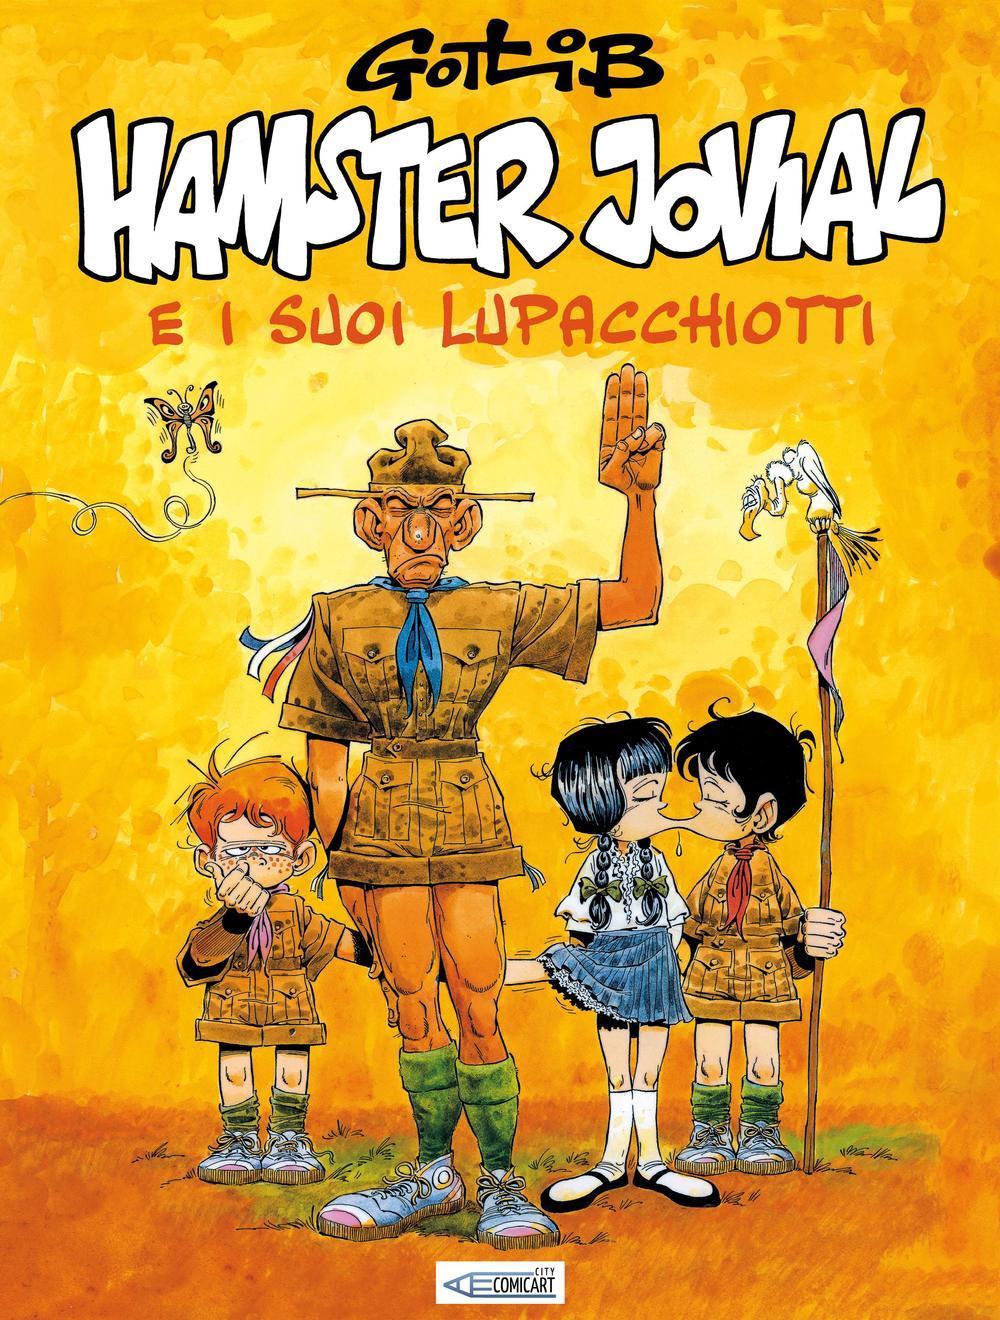 HAMSTER JOVIAL E I SUOI LUPACCHIOTTI - 9788894115161